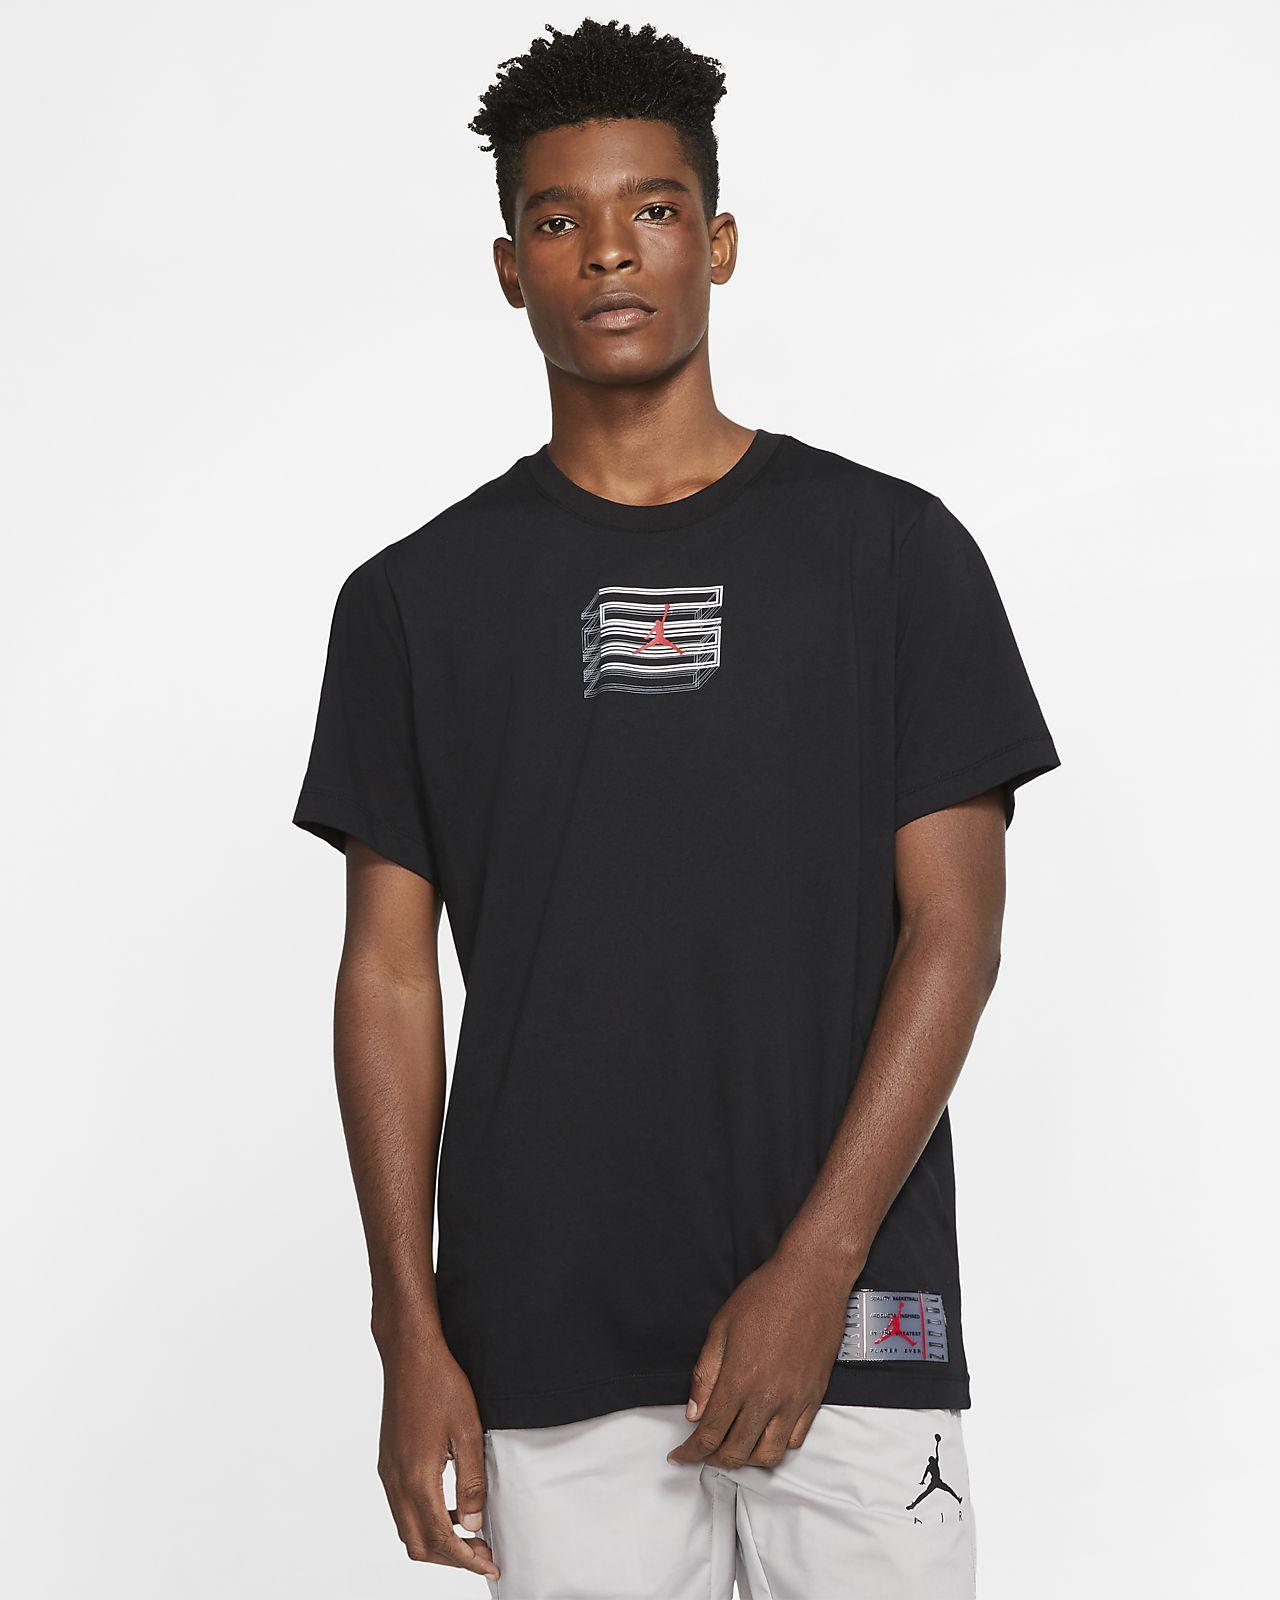 Jordan Legacy AJ11 '23' T-Shirt